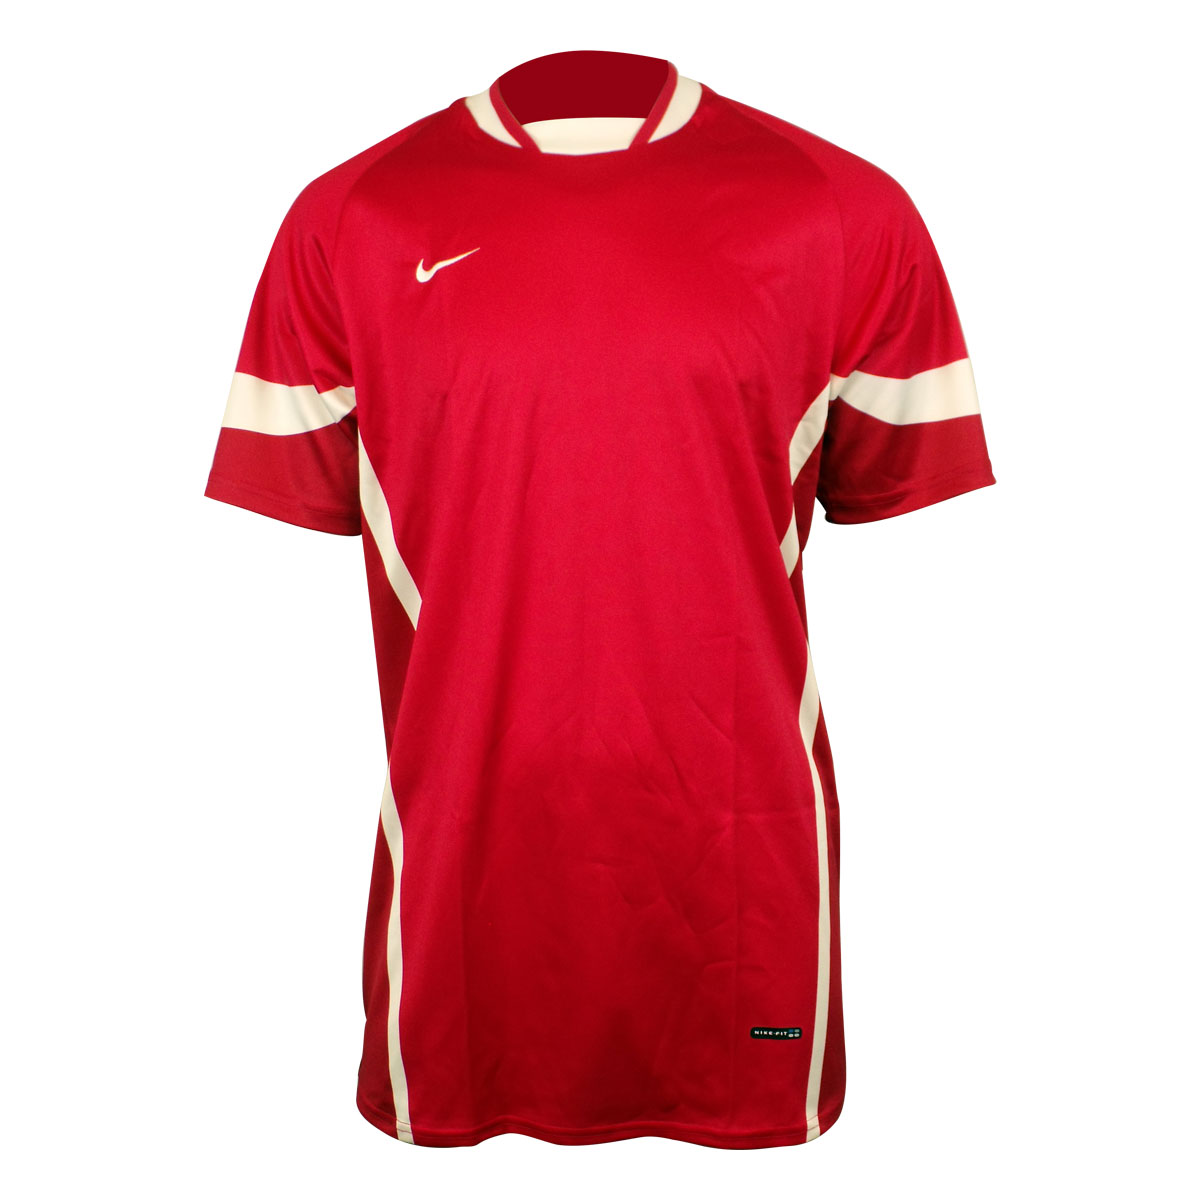 Mens nike sports dry dri fit running shirt top t shirt gym for Dri fit t shirts nike